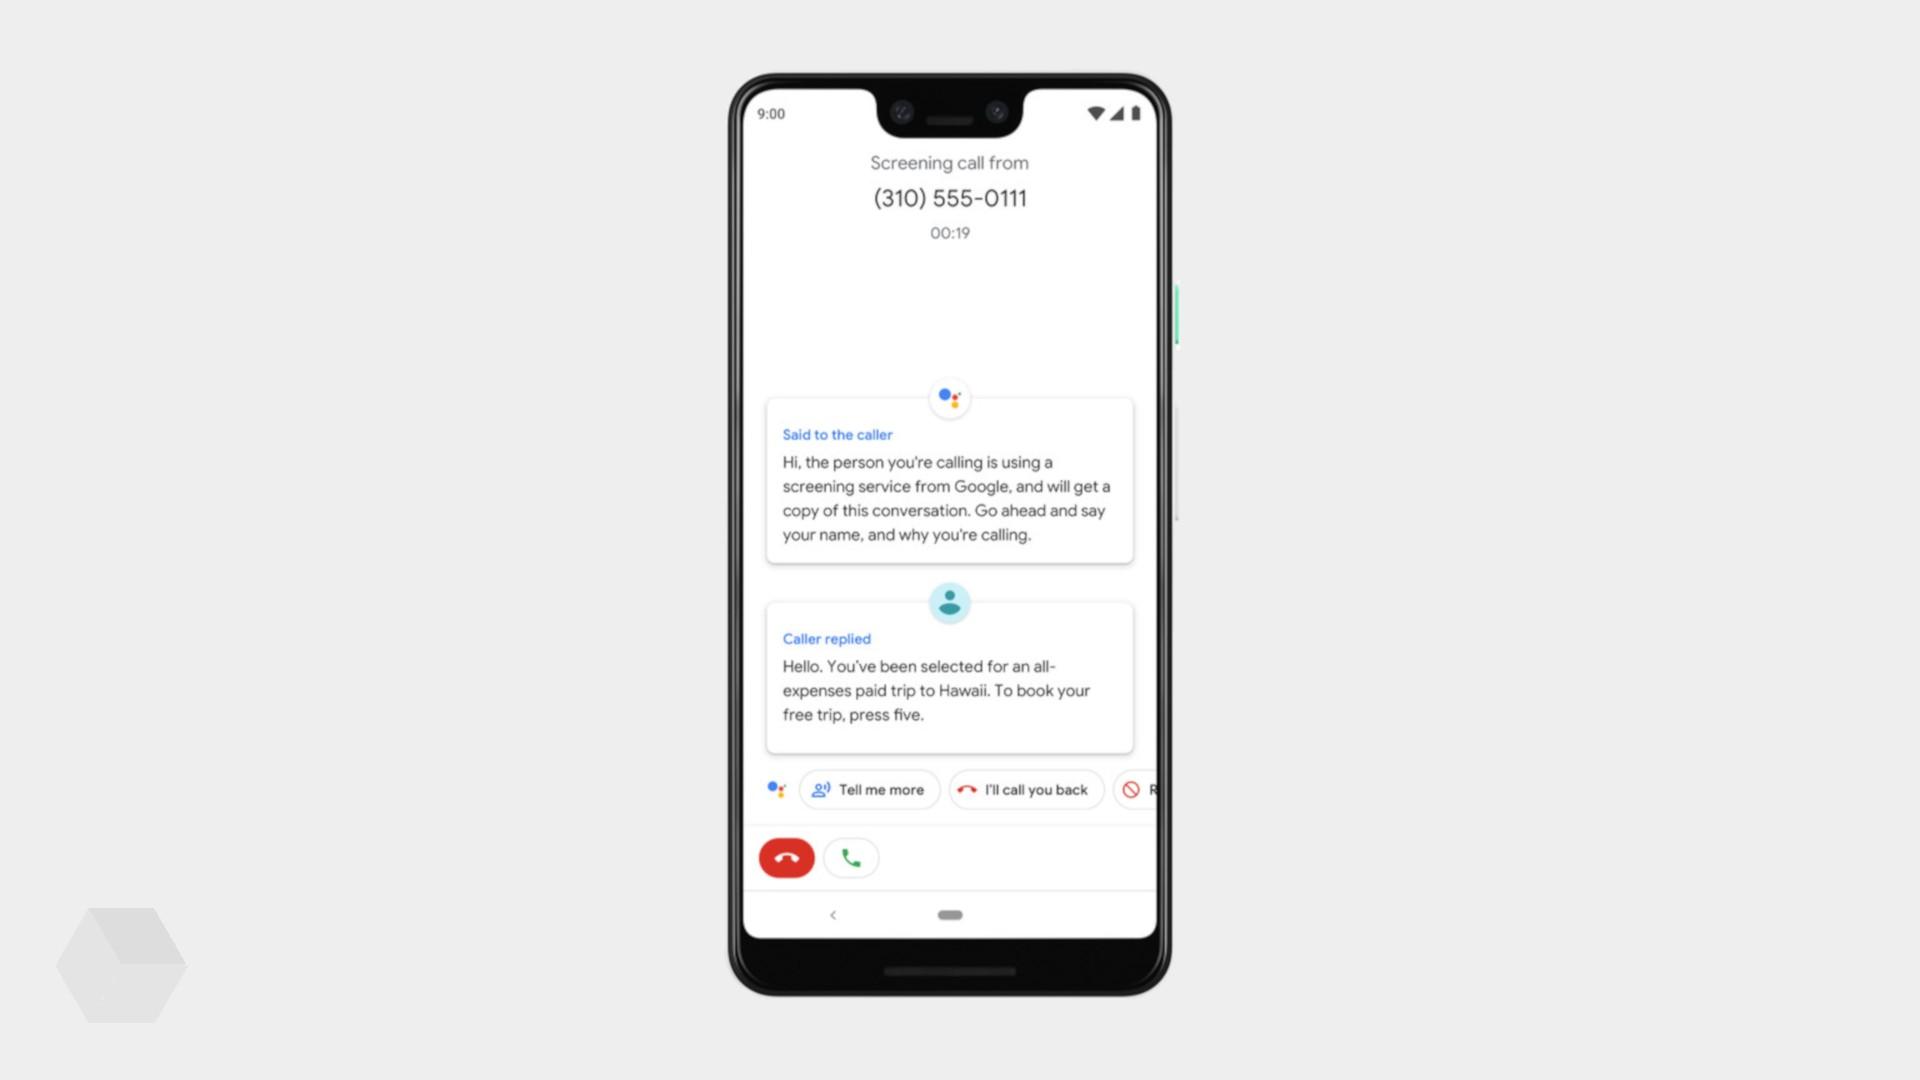 Google Ассистент сам ответит на спам-звонок